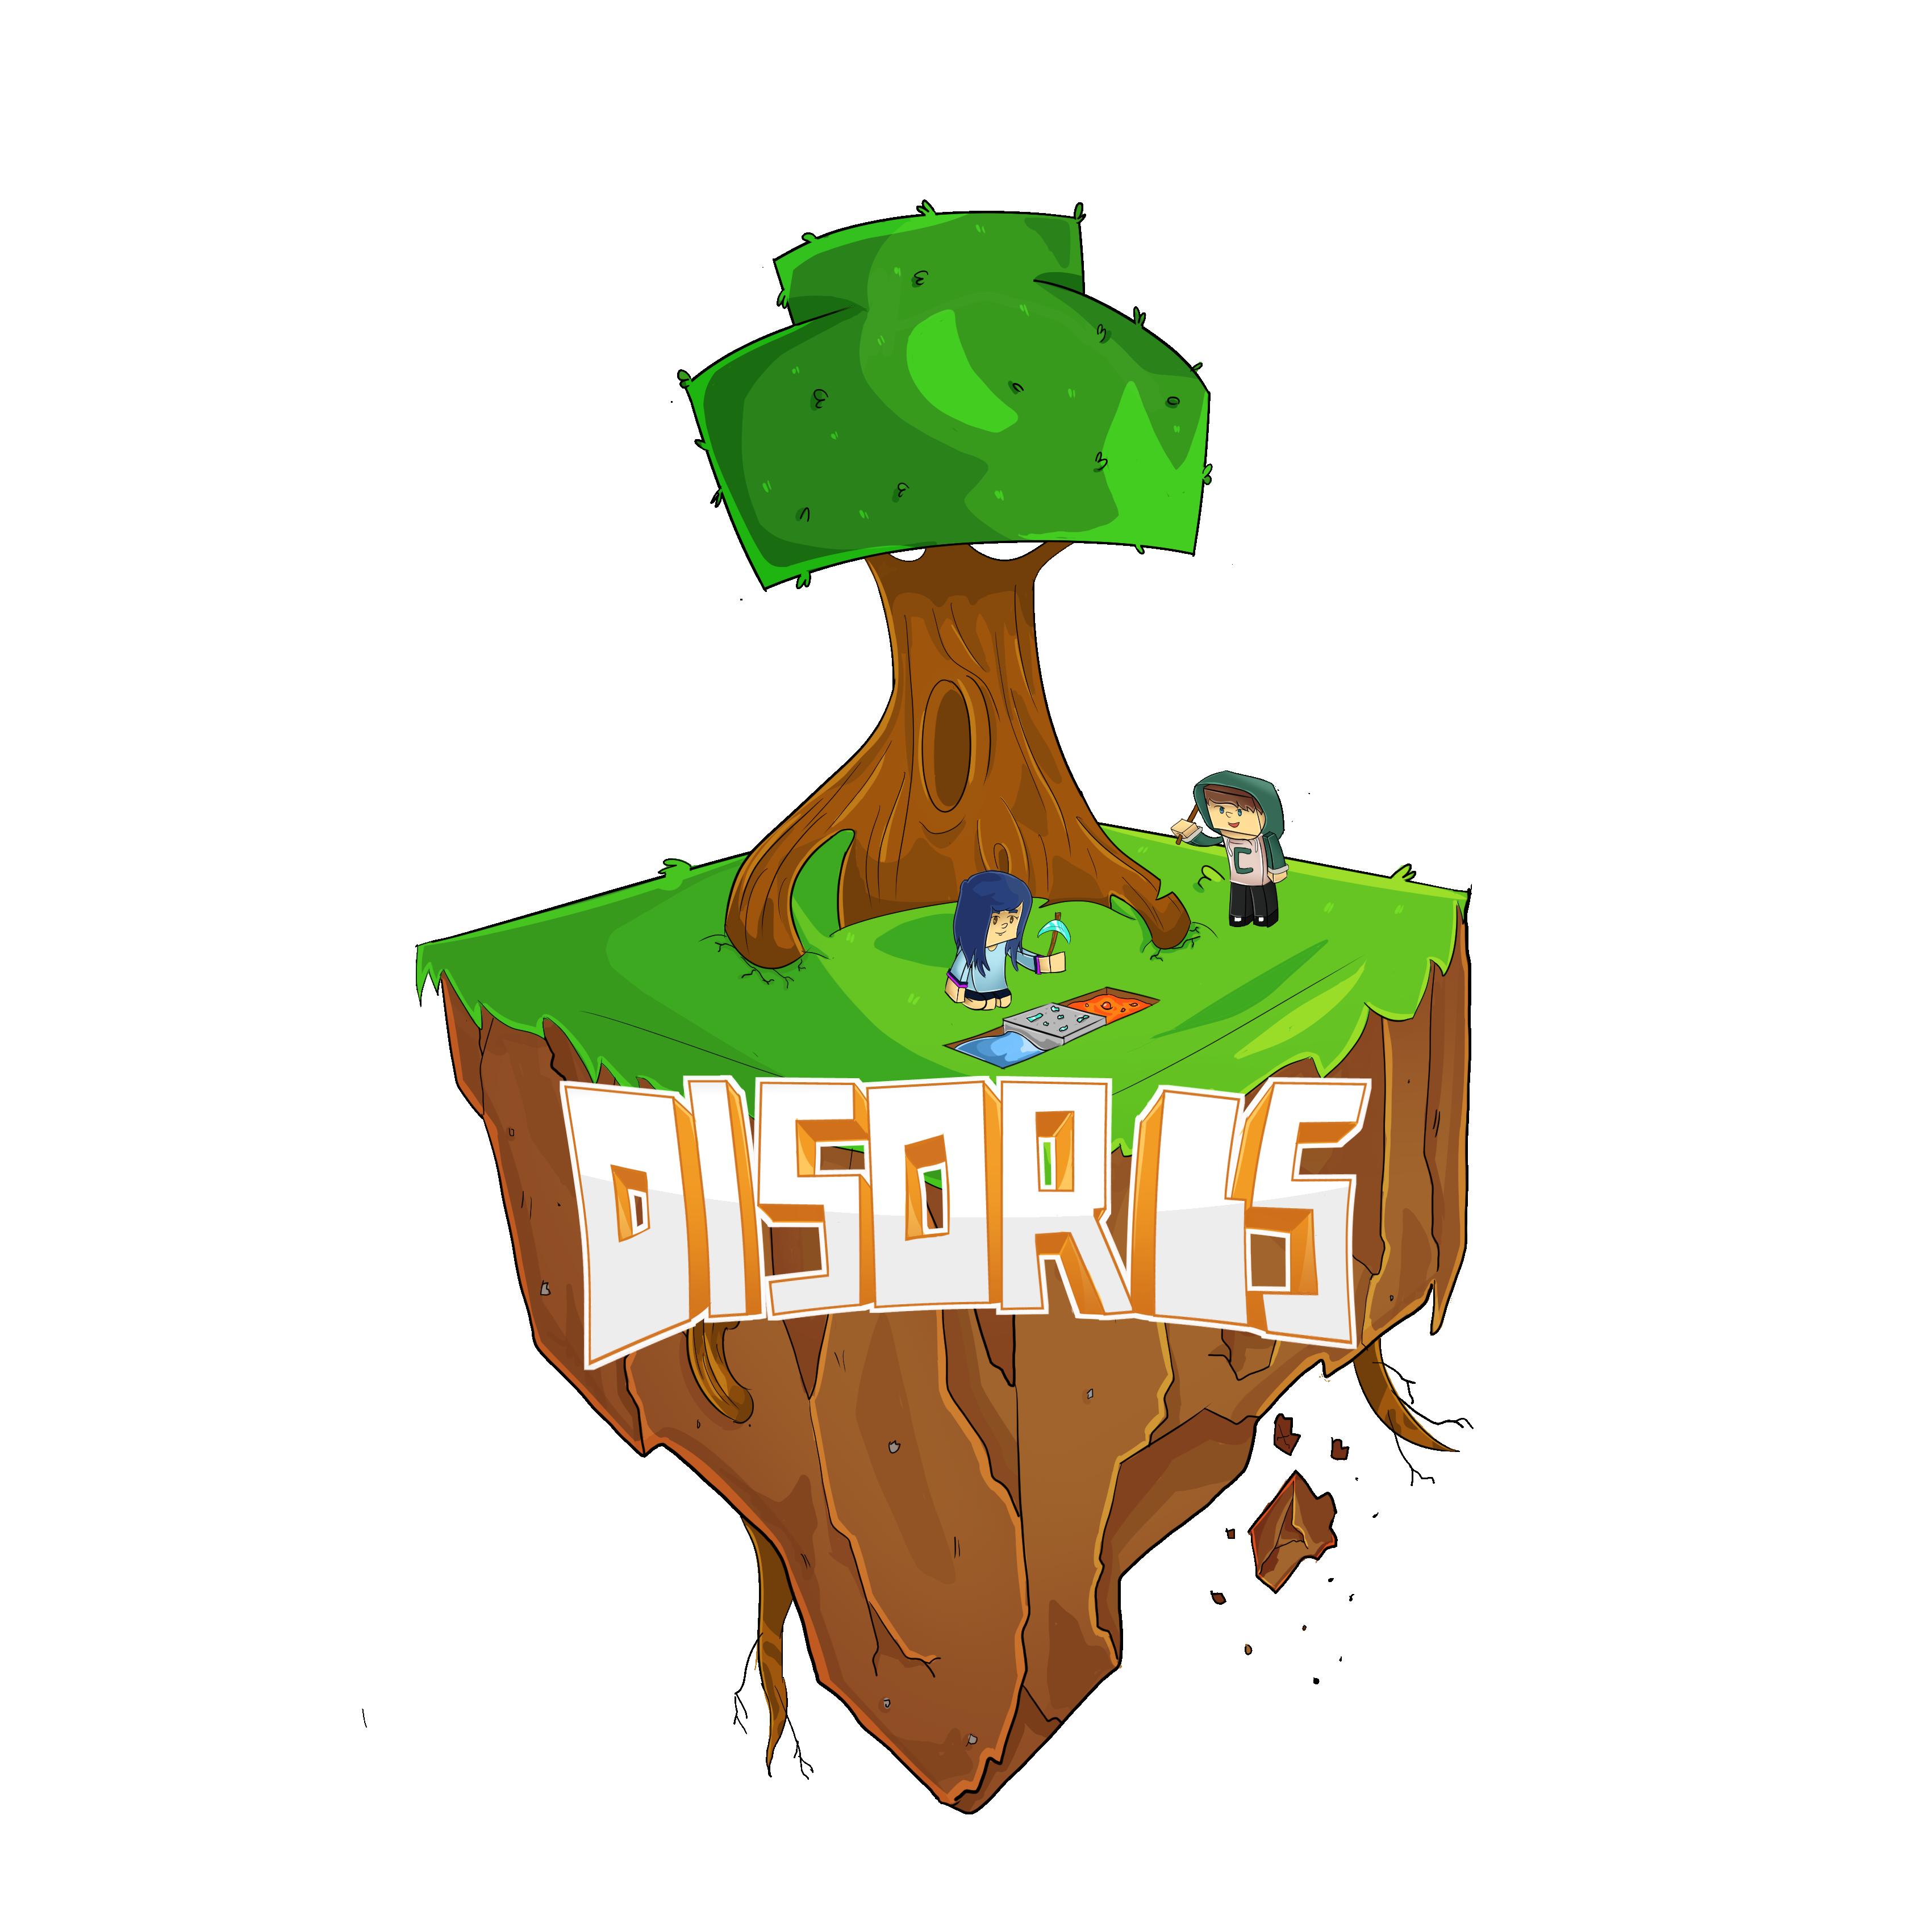 Glitch clipart green bug Disorbs Disorbs Forum Network Bug/Glitches